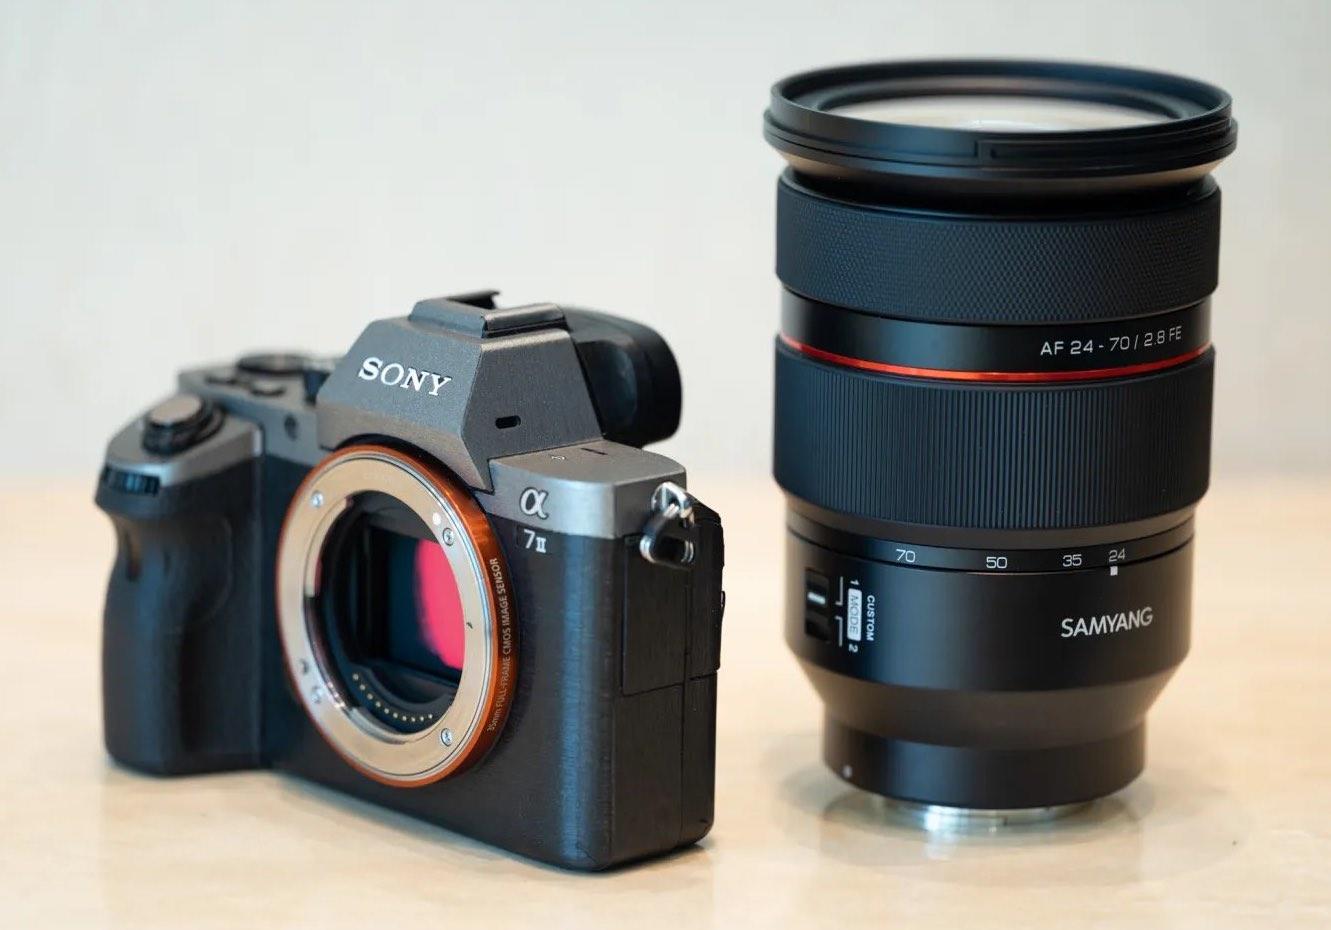 Зум-объектив Samyang AF 24-70mm f/2.8 FE с камерой Sony